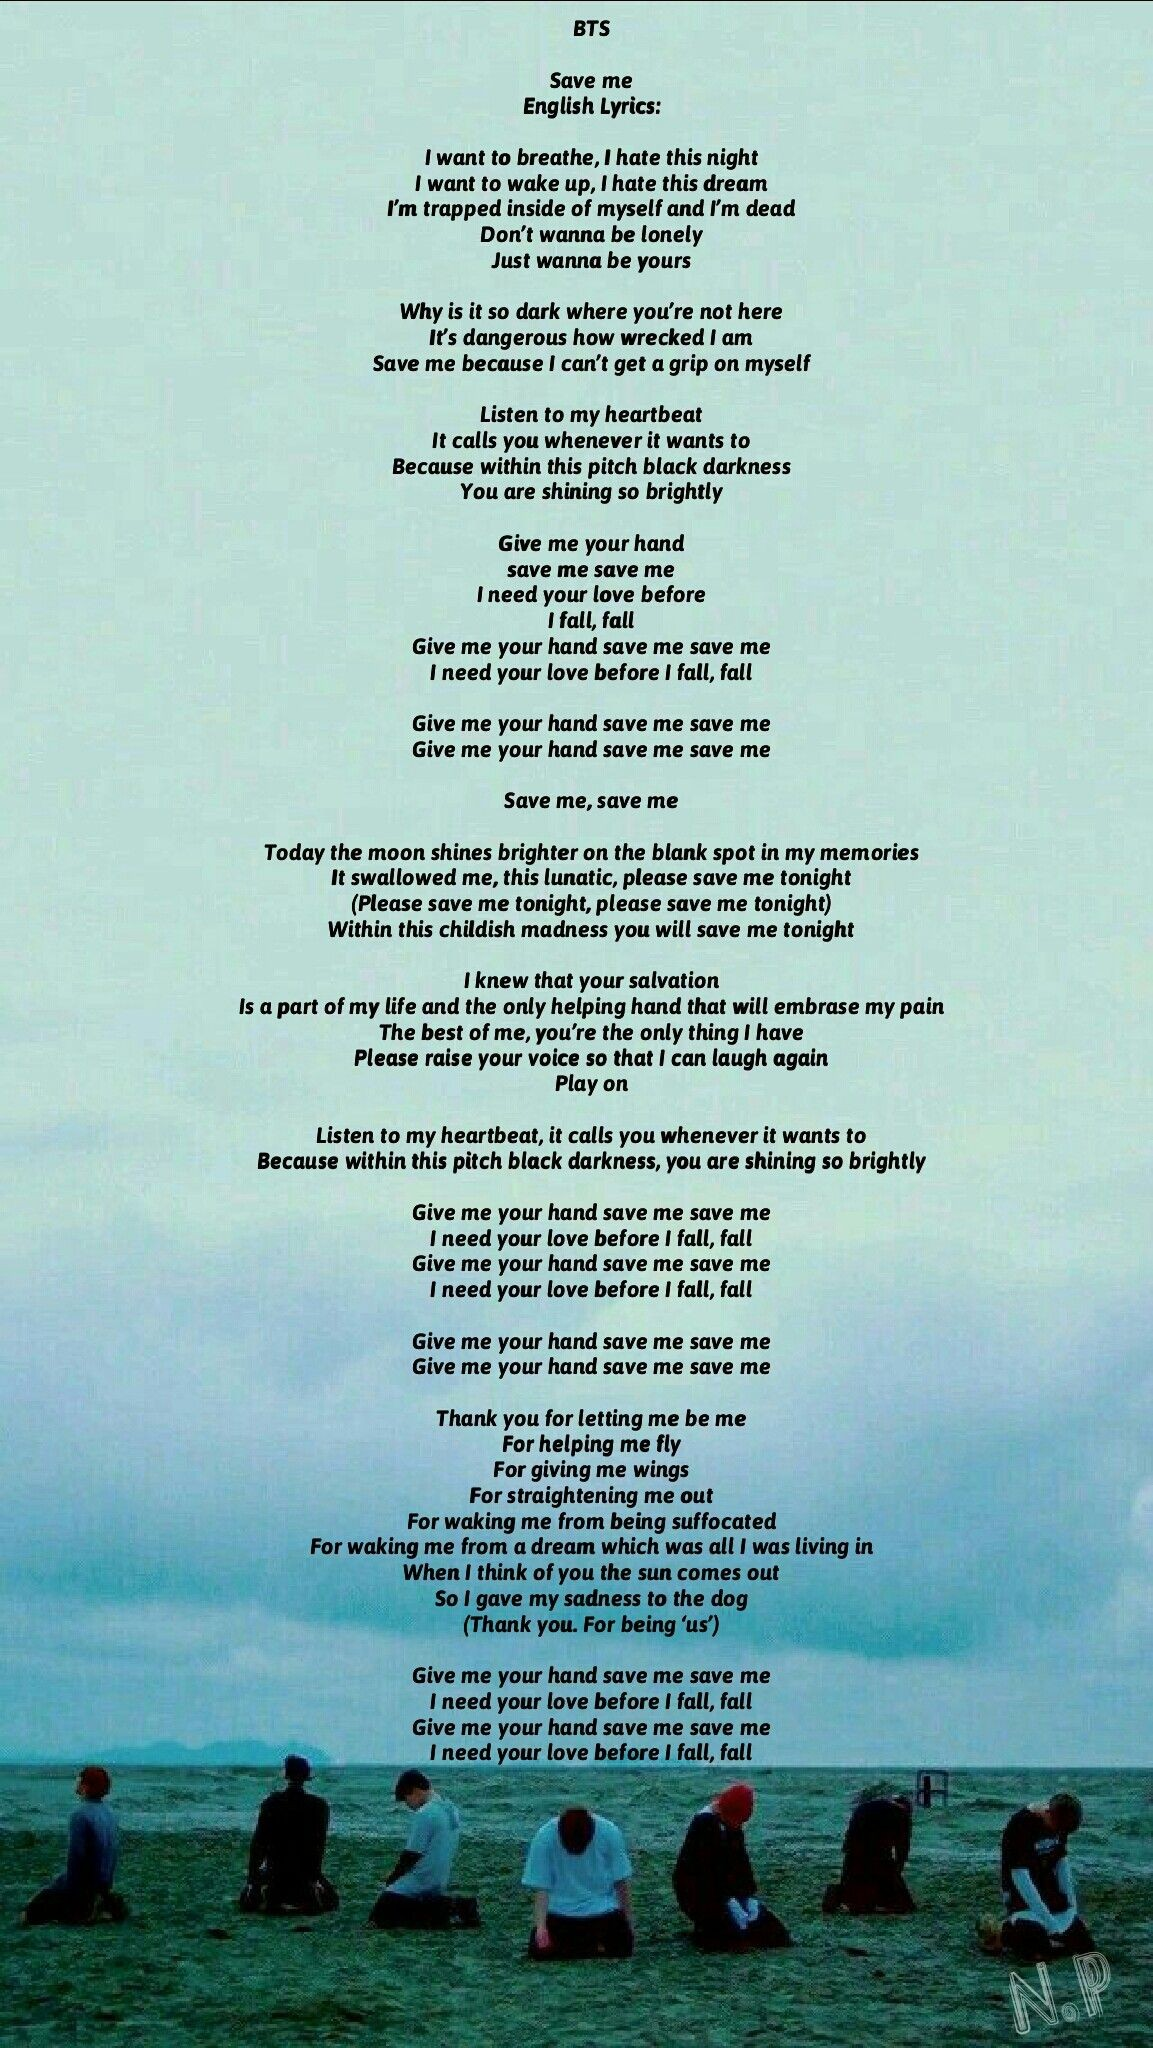 12 Bts Save Me Bts Save Me English Cover Lyrics 599096 Hd